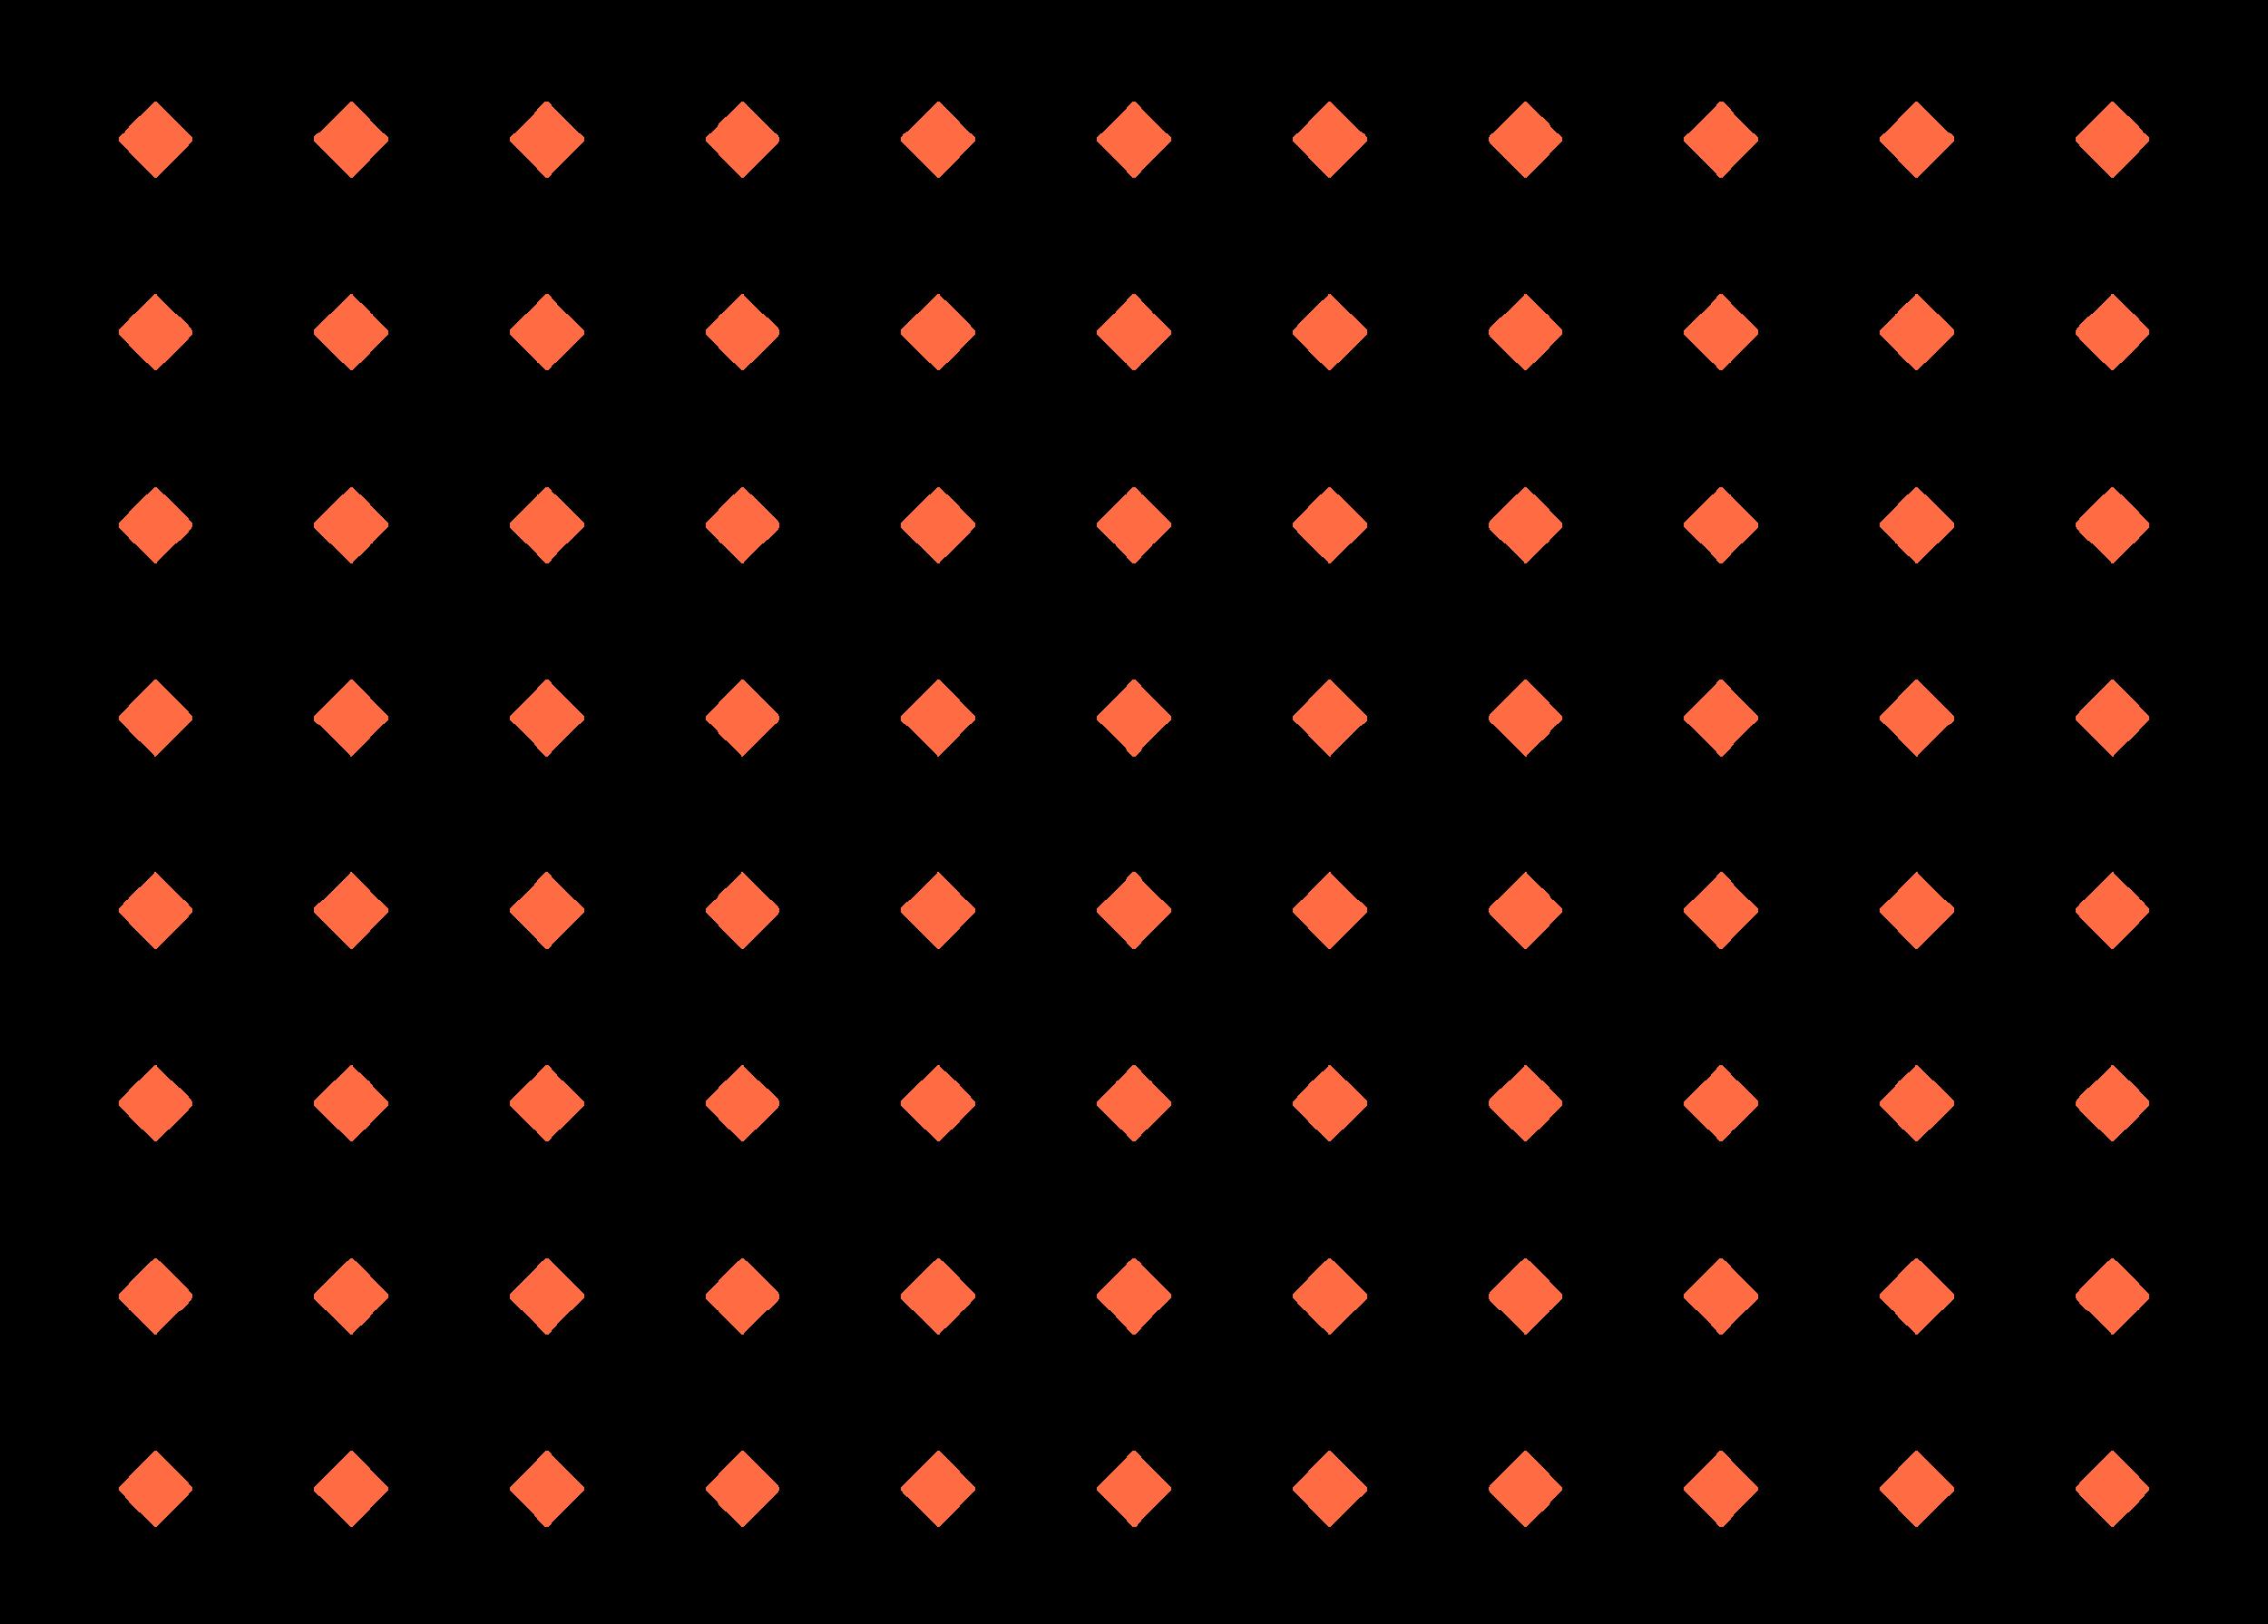 orange-grid.png